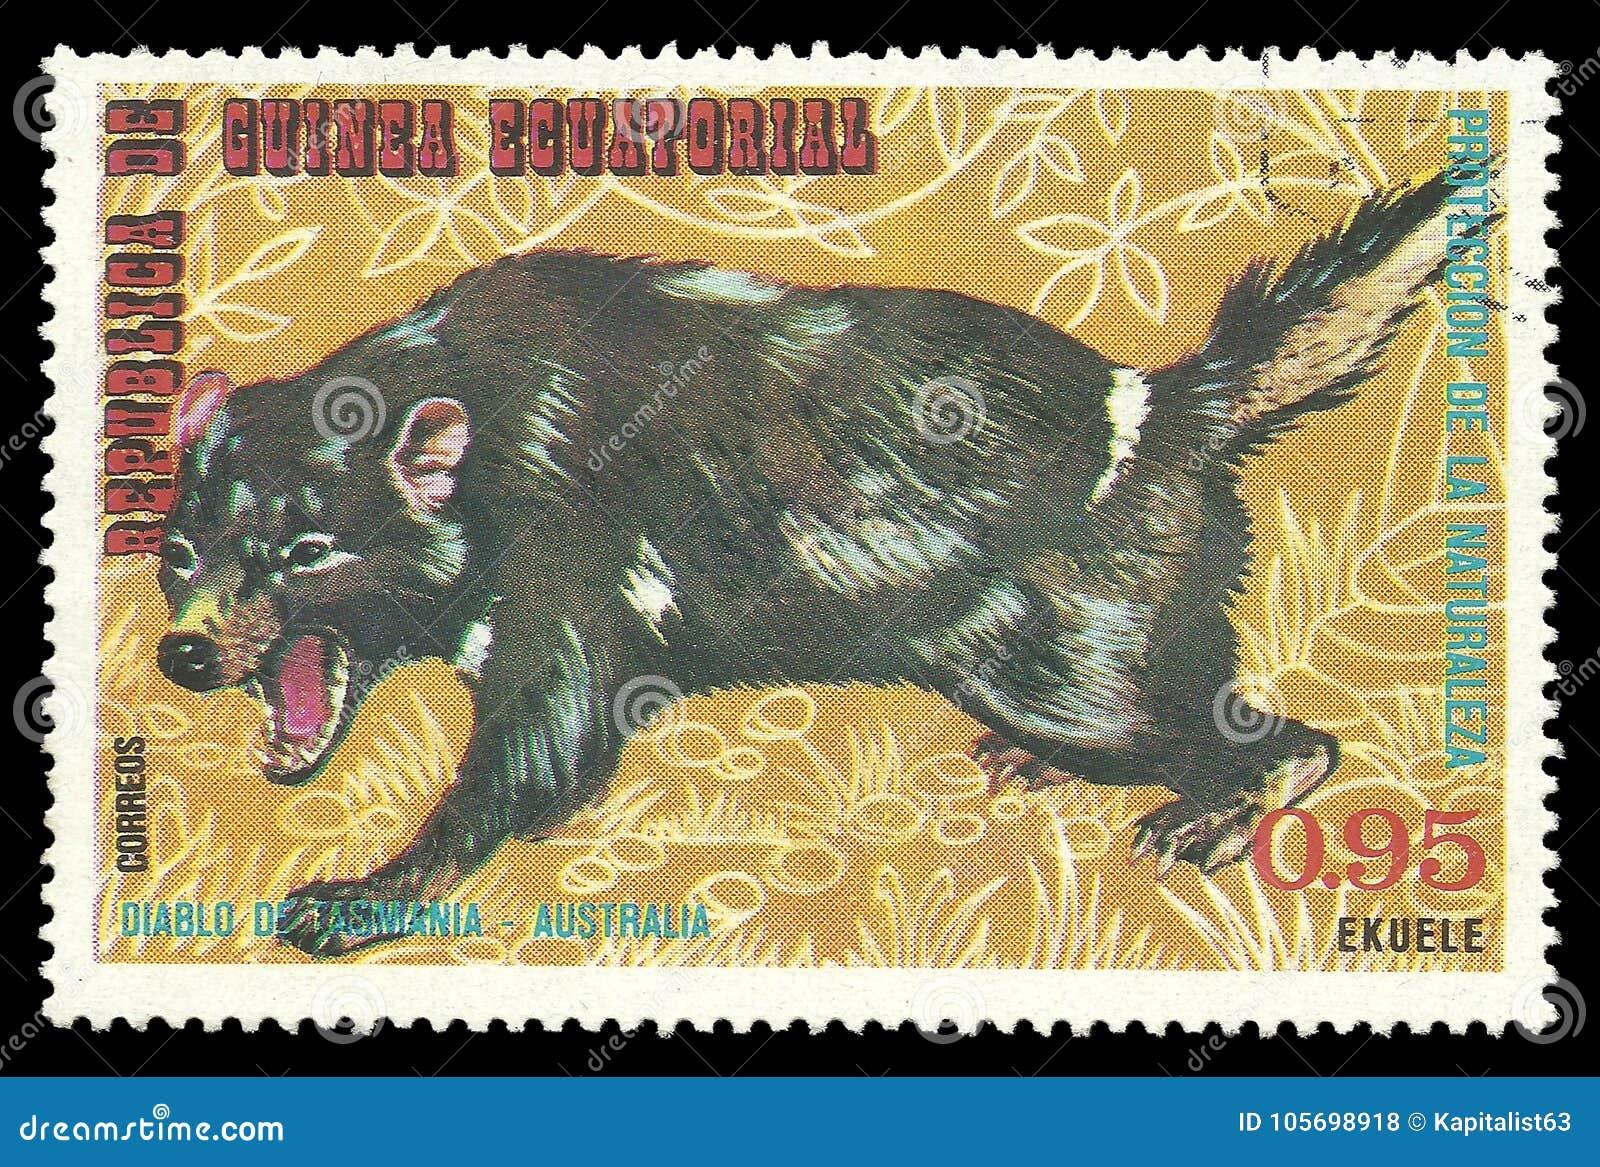 Australian Animals, Tasmanian Devil